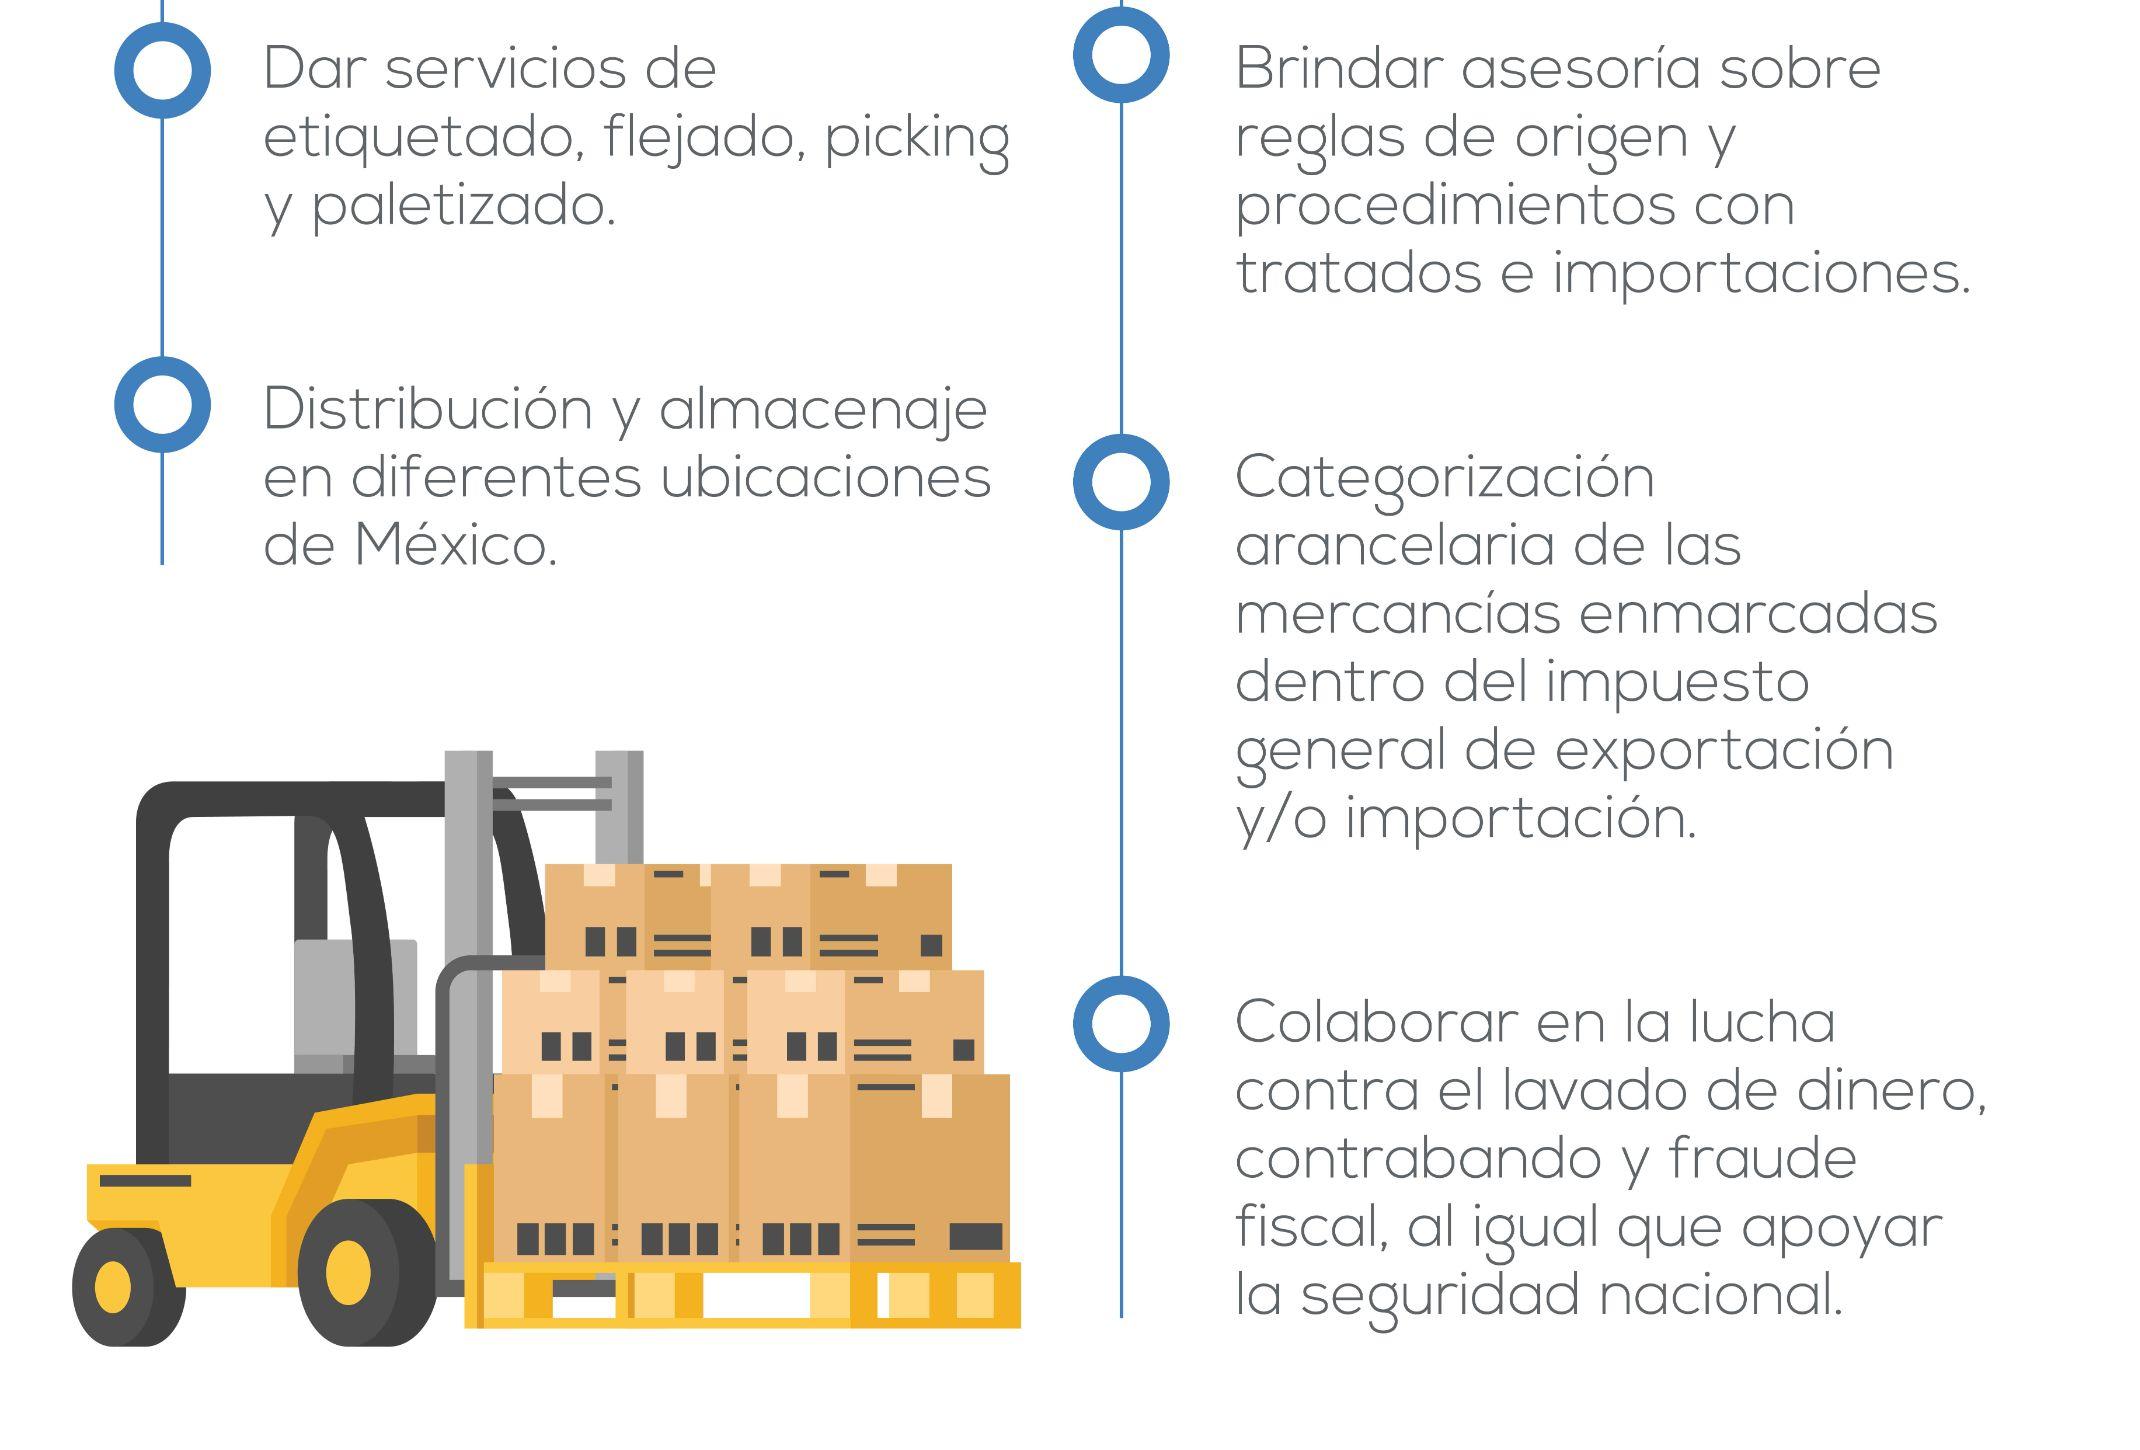 infografia-villuendas-p2